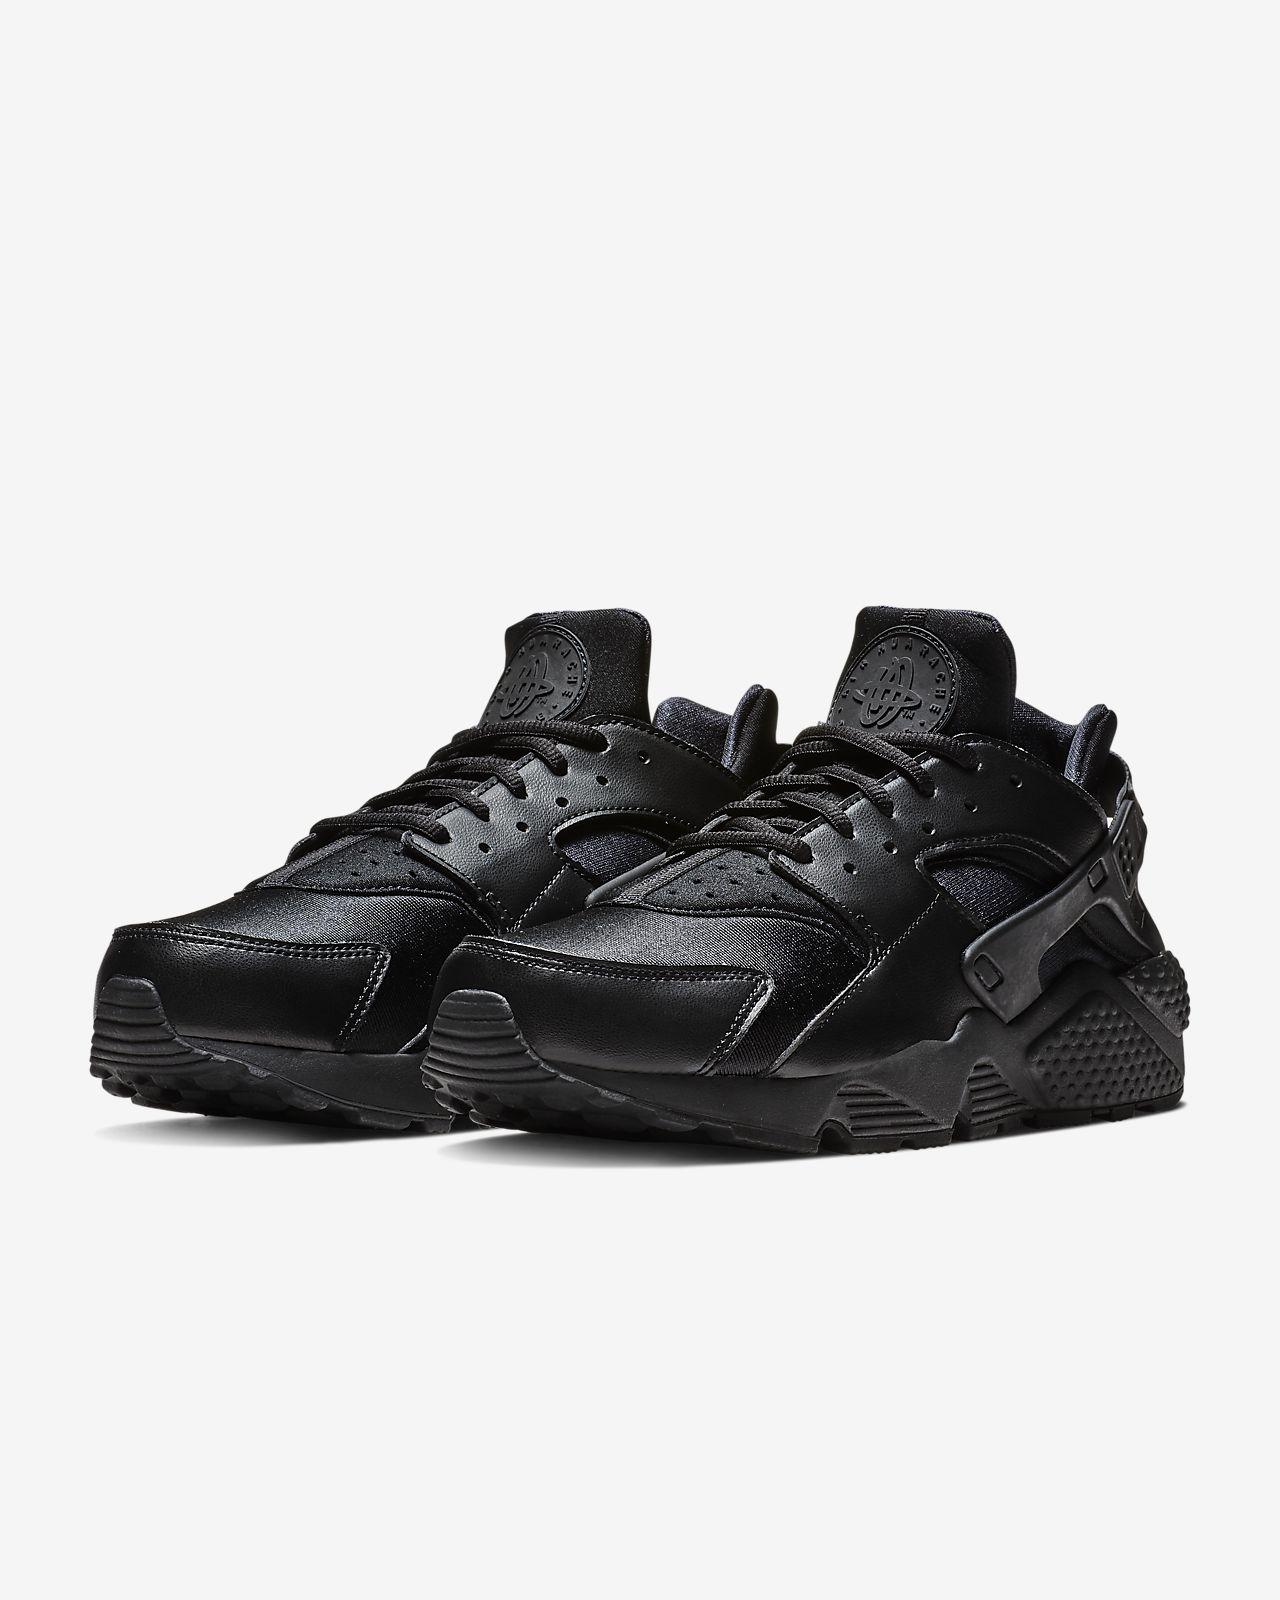 new style bcc8a 61b8d Nike Air Huarache Women's Shoe